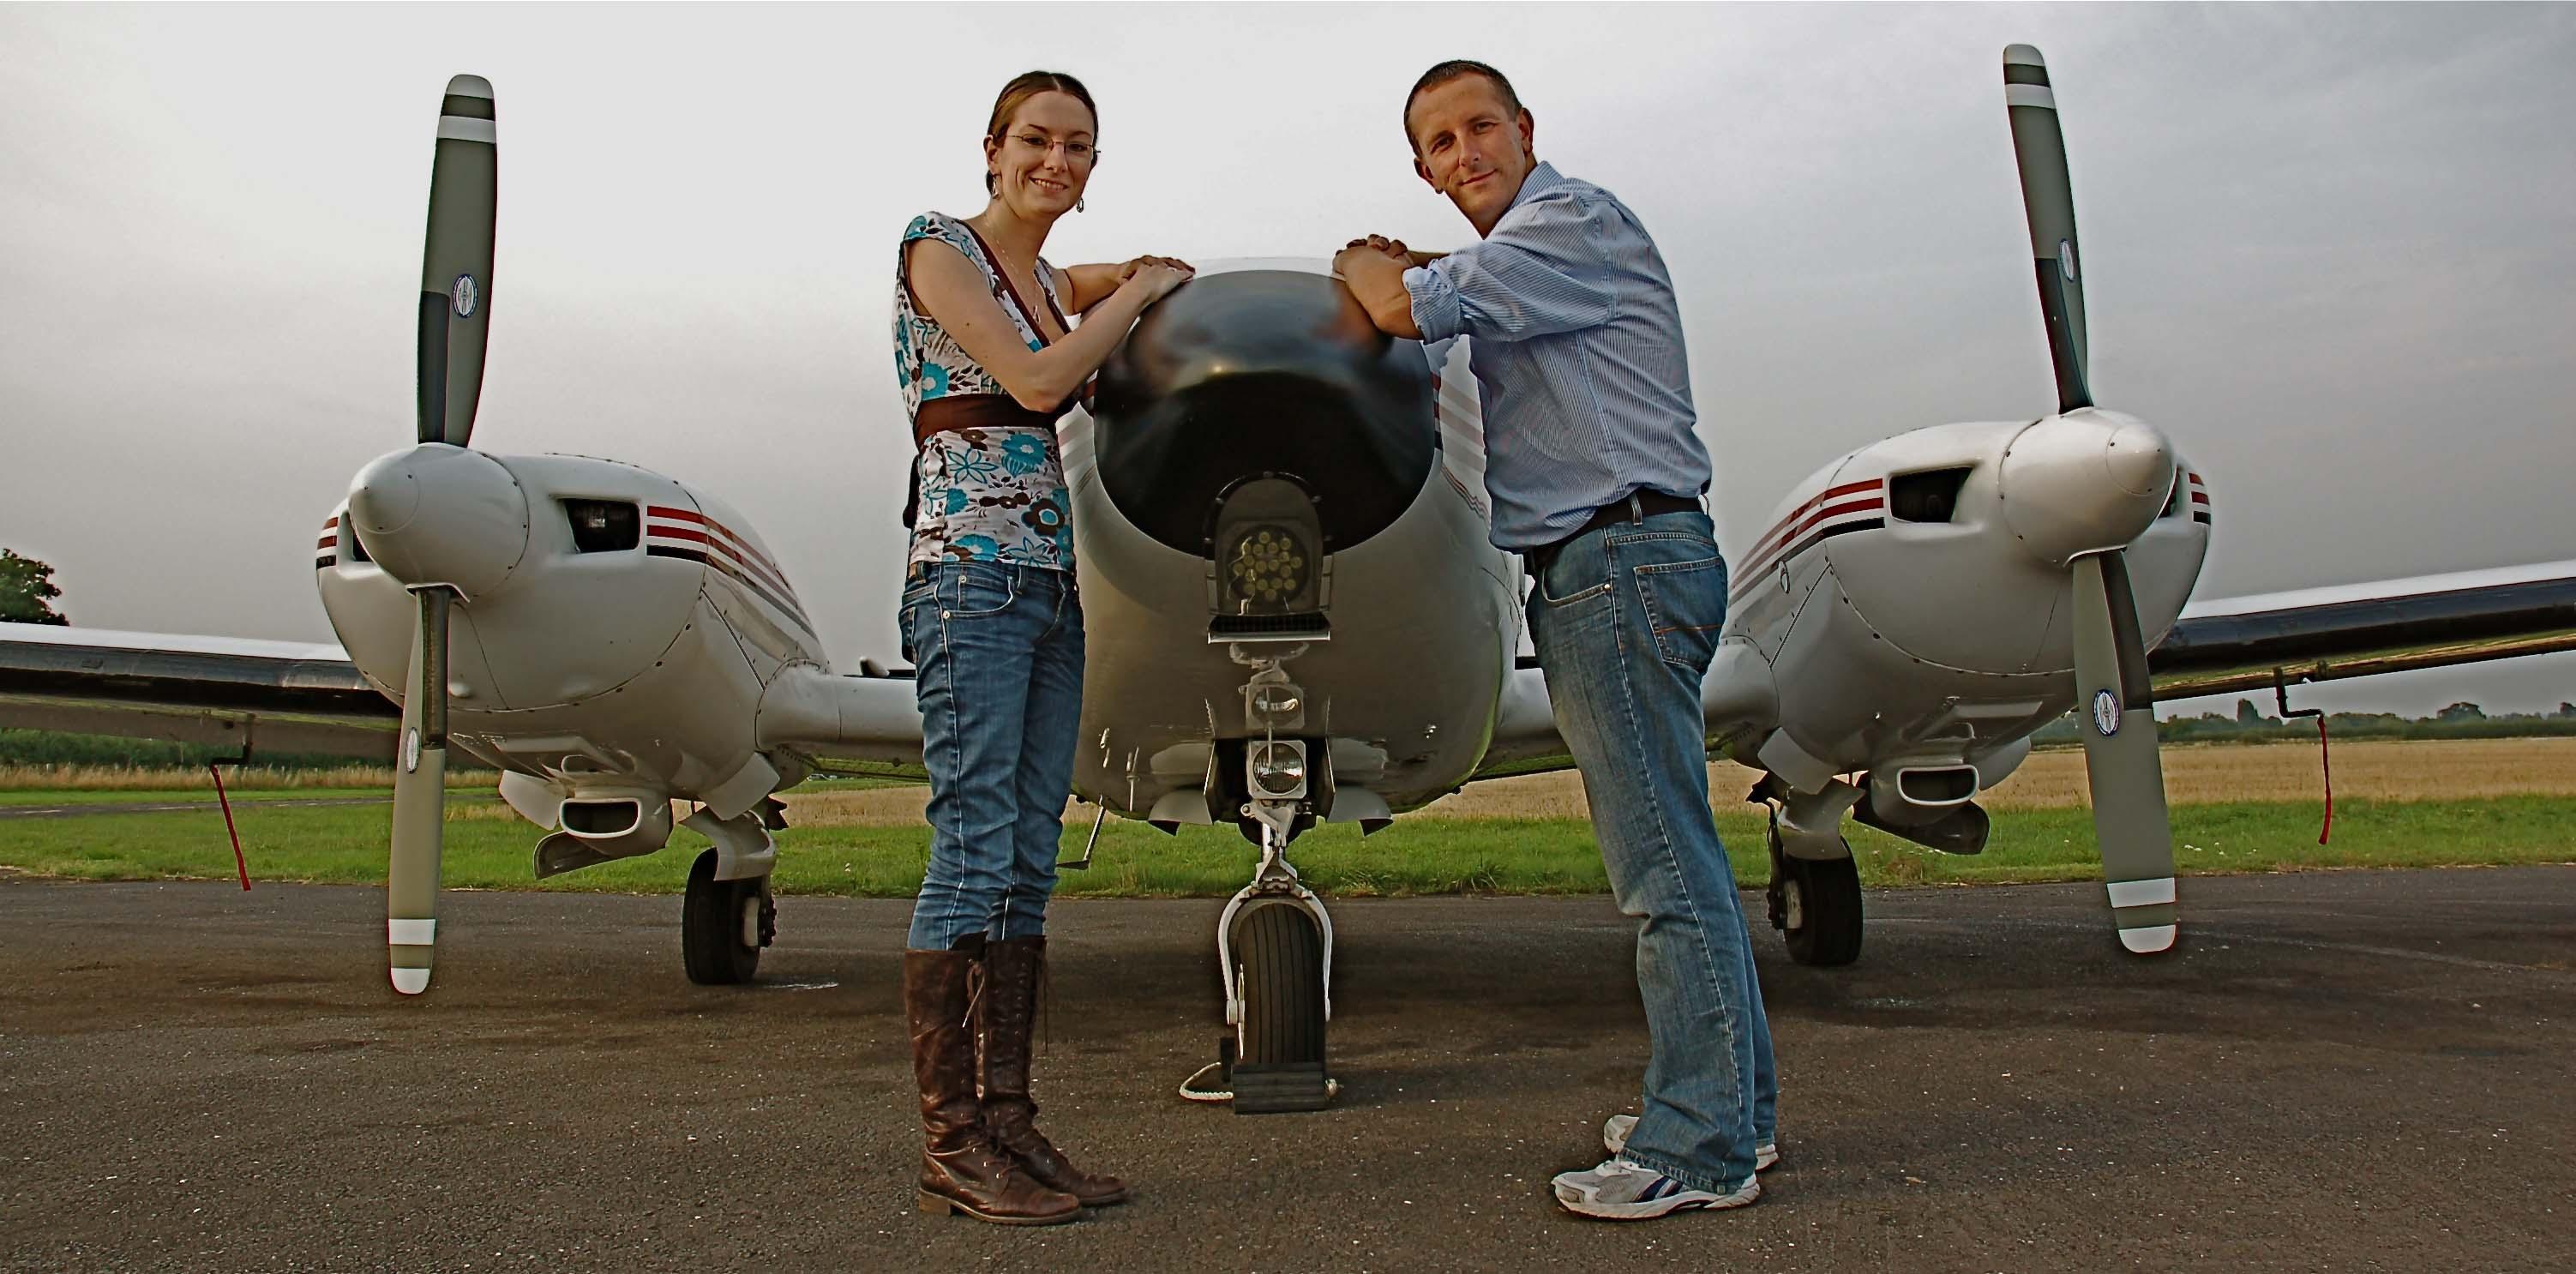 Rachel and Lee